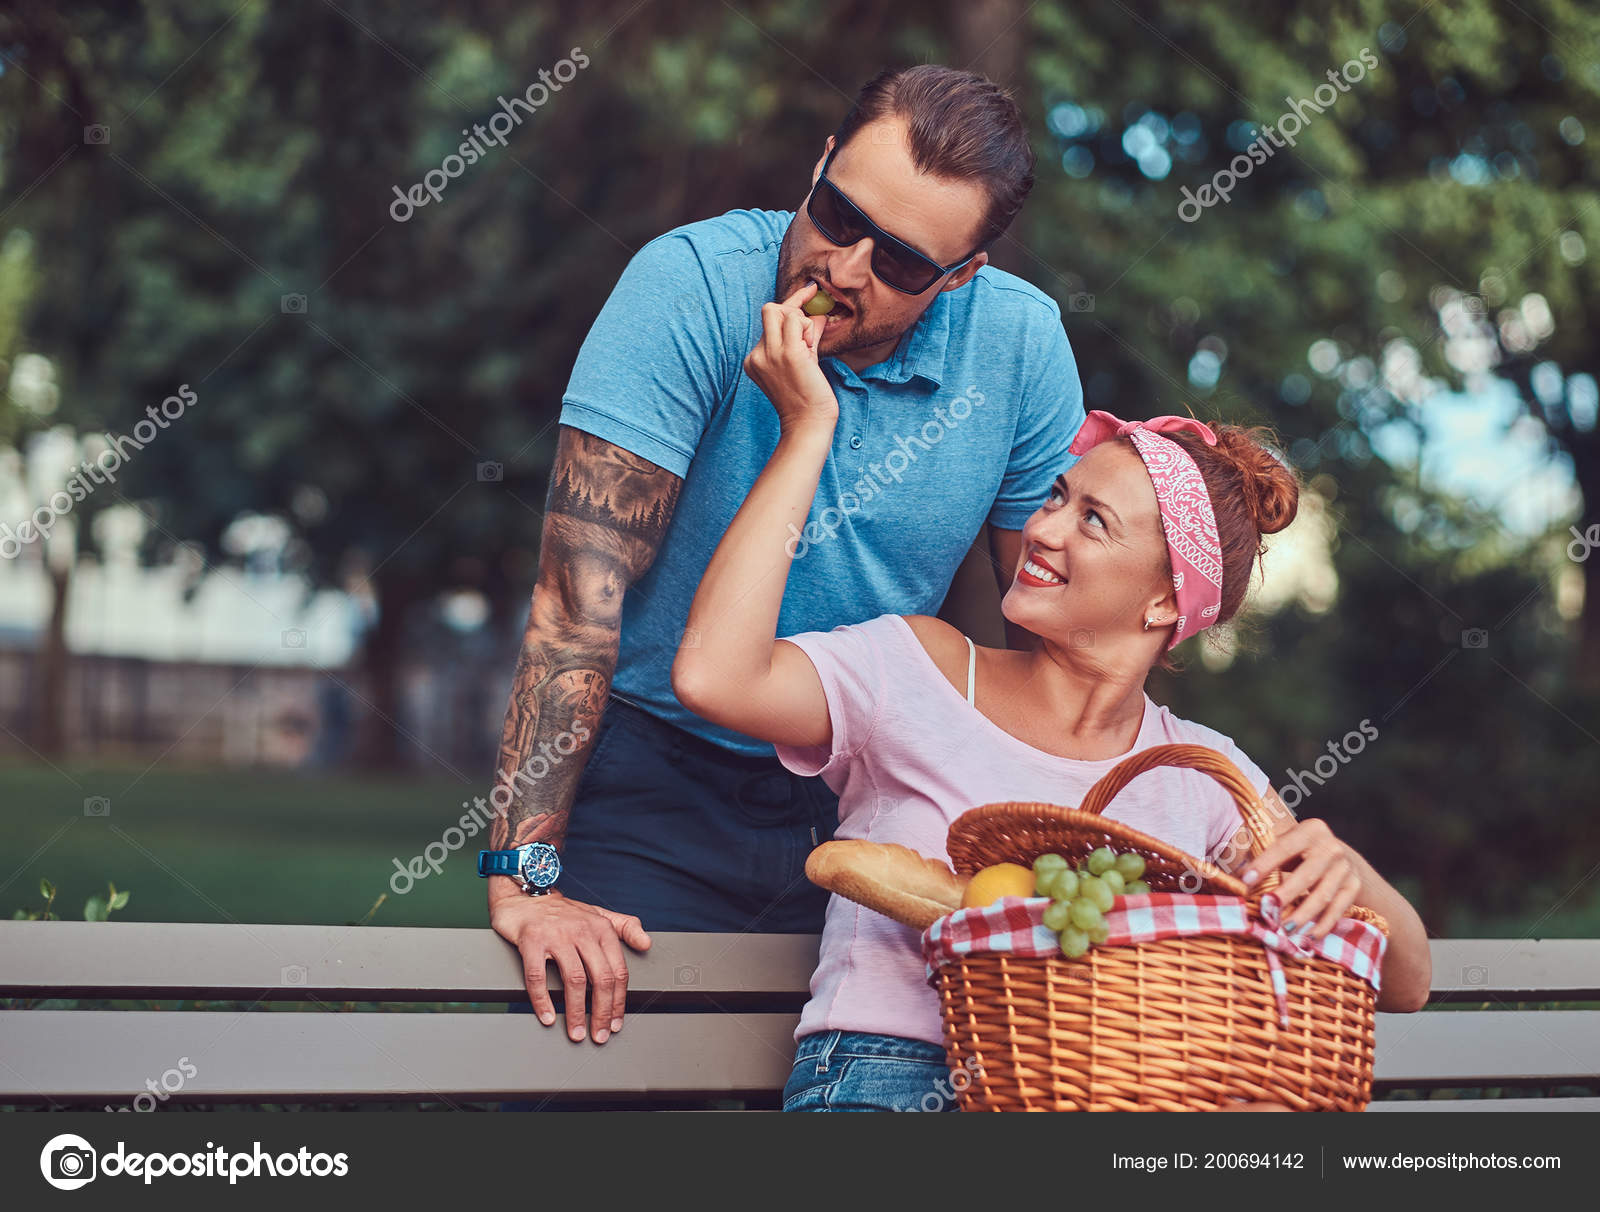 ardara matchmaking festival